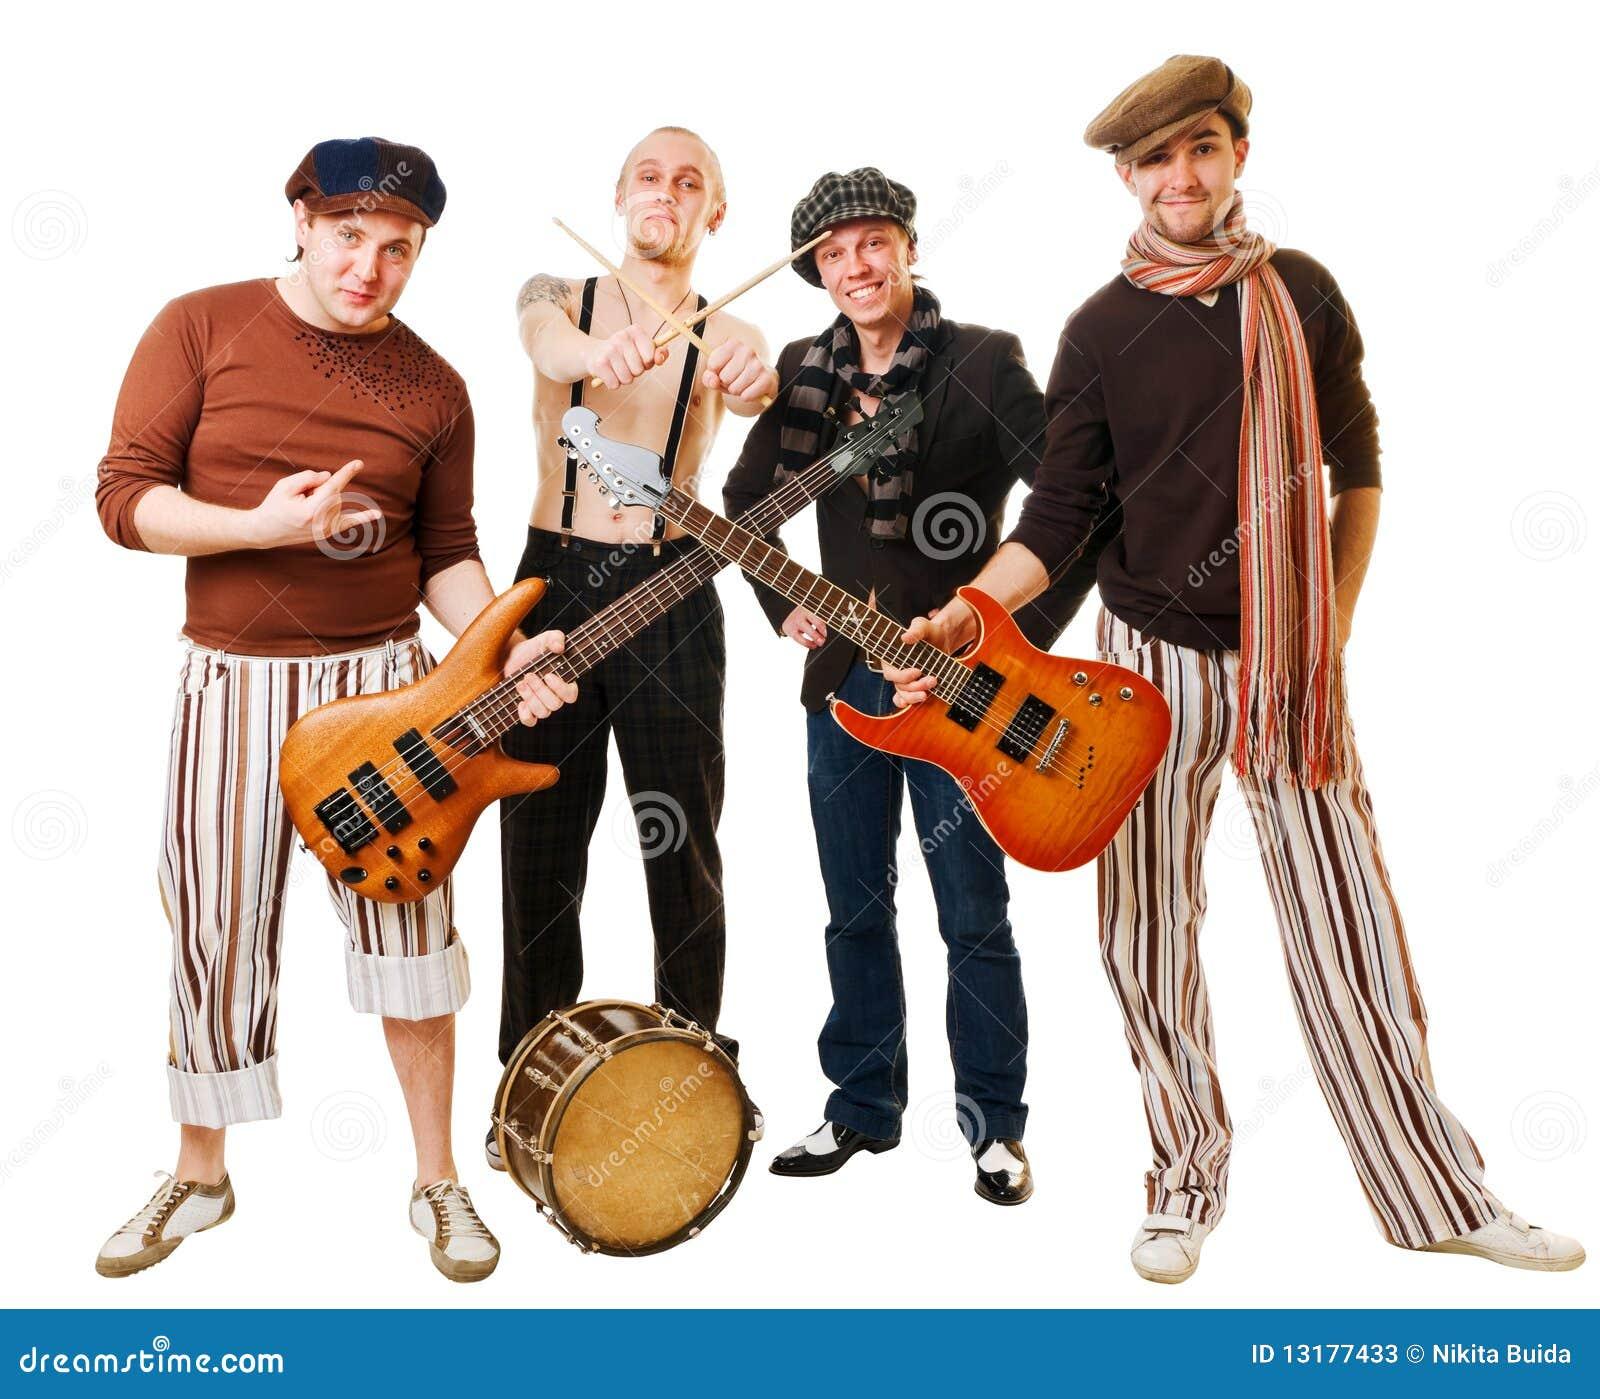 Bandinstrumentmusikal deras white